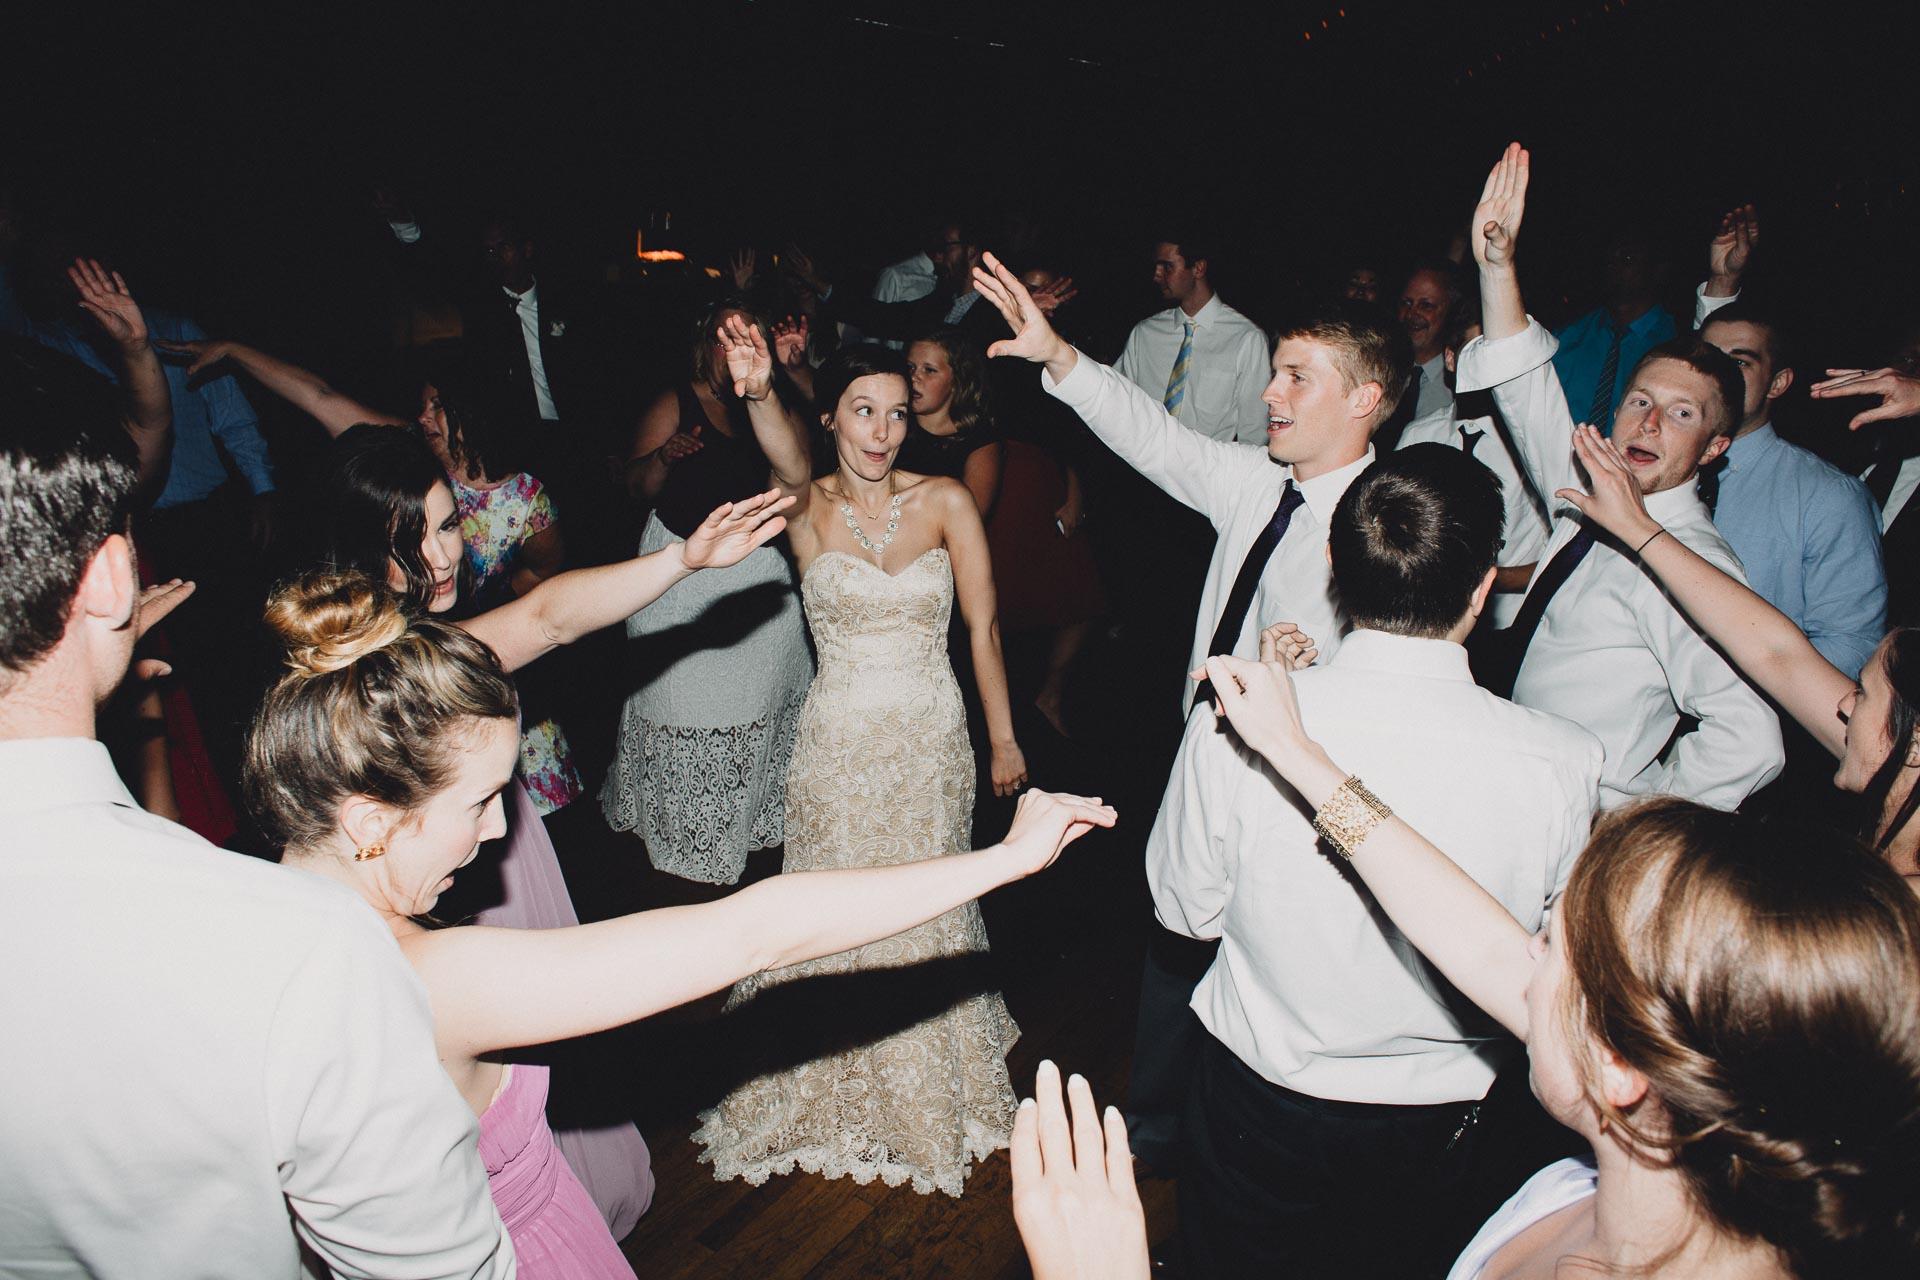 Julia-Michael-Cincinnati-Music-Hall-Wedding-143@2x.jpg